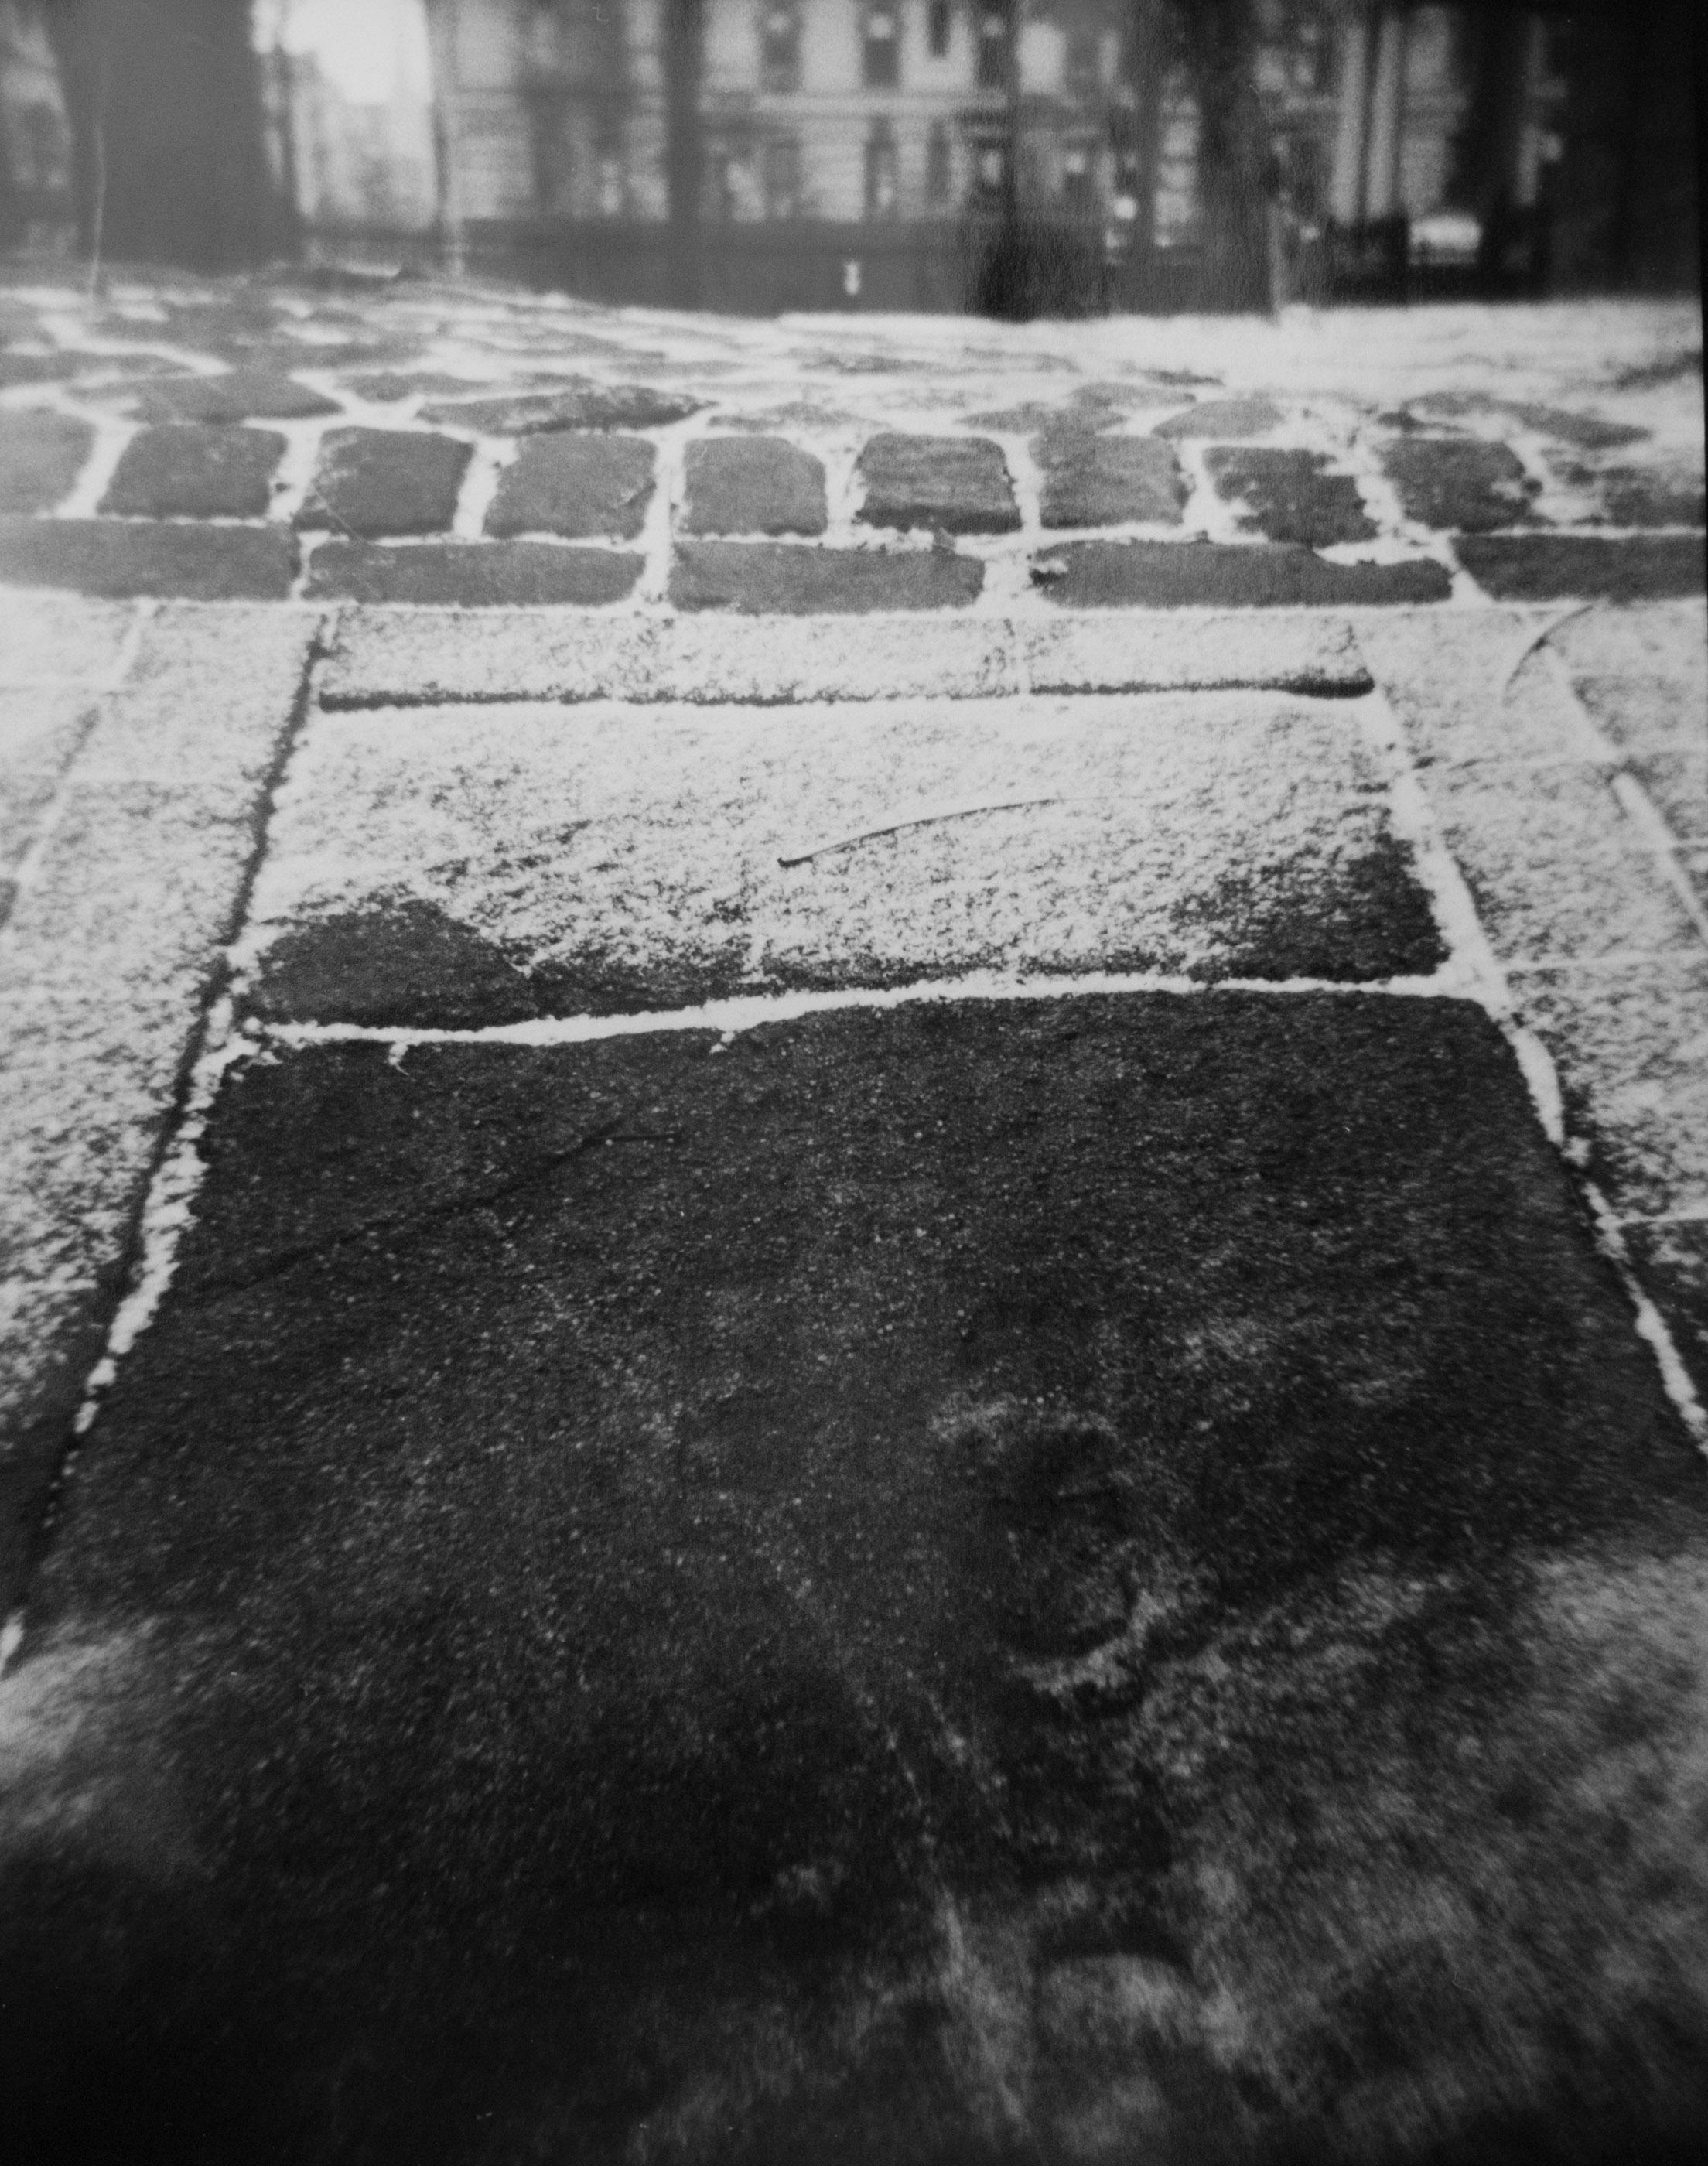 3_Grave Ground_St. Mark's Church-in-the-Bowerie, 1999-2000_.jpg